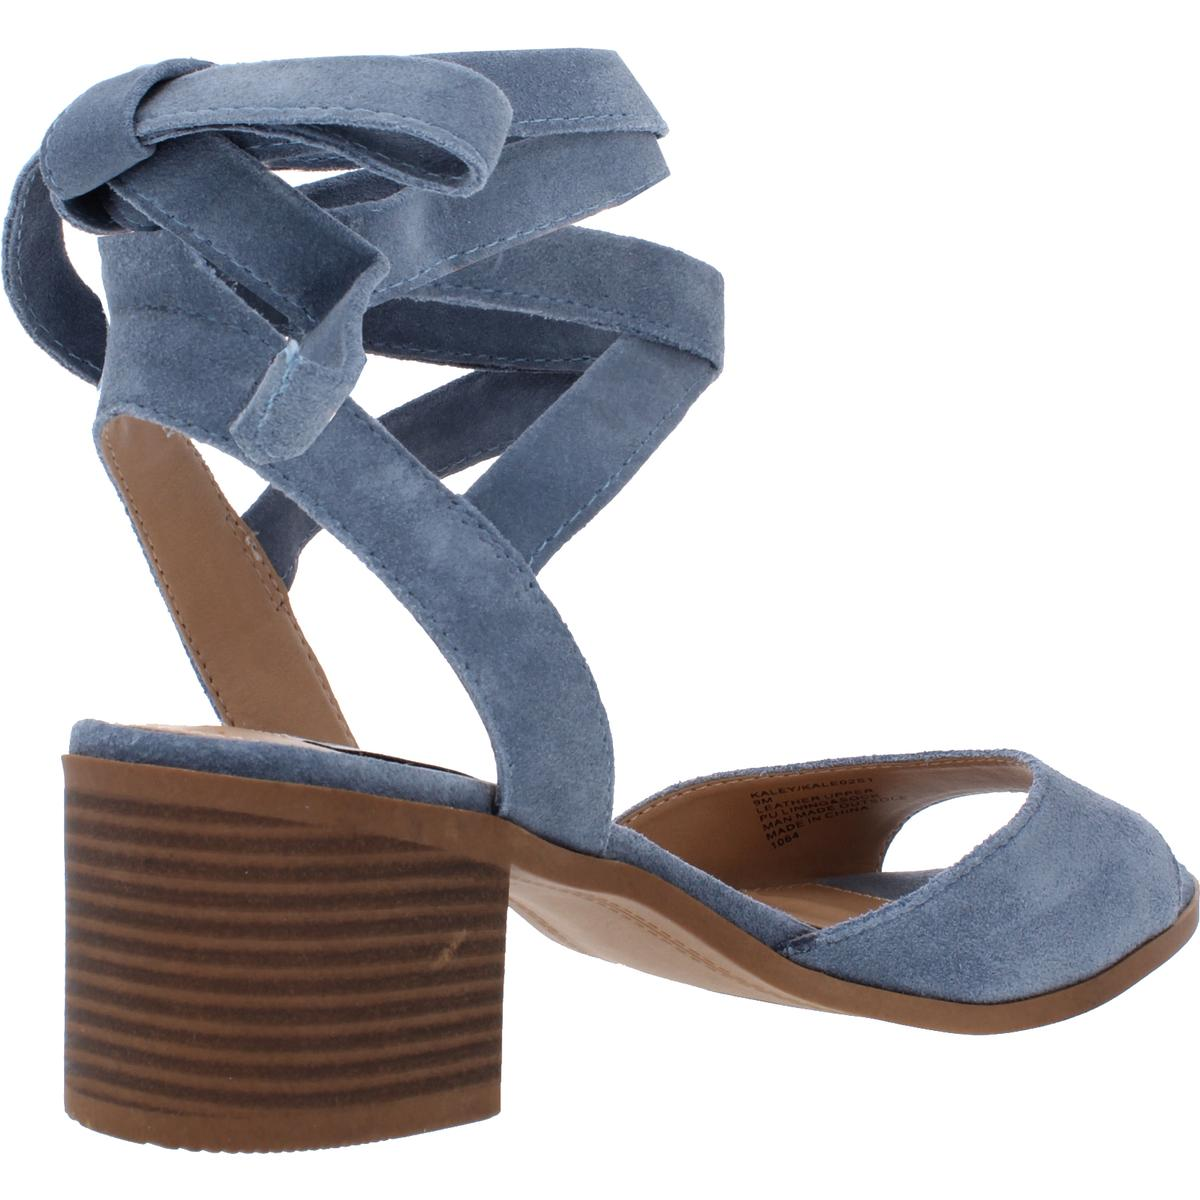 Steve-Madden-Womens-Kaley-Suede-Ankle-Wrap-Dress-Sandals-Shoes-BHFO-0145 thumbnail 4